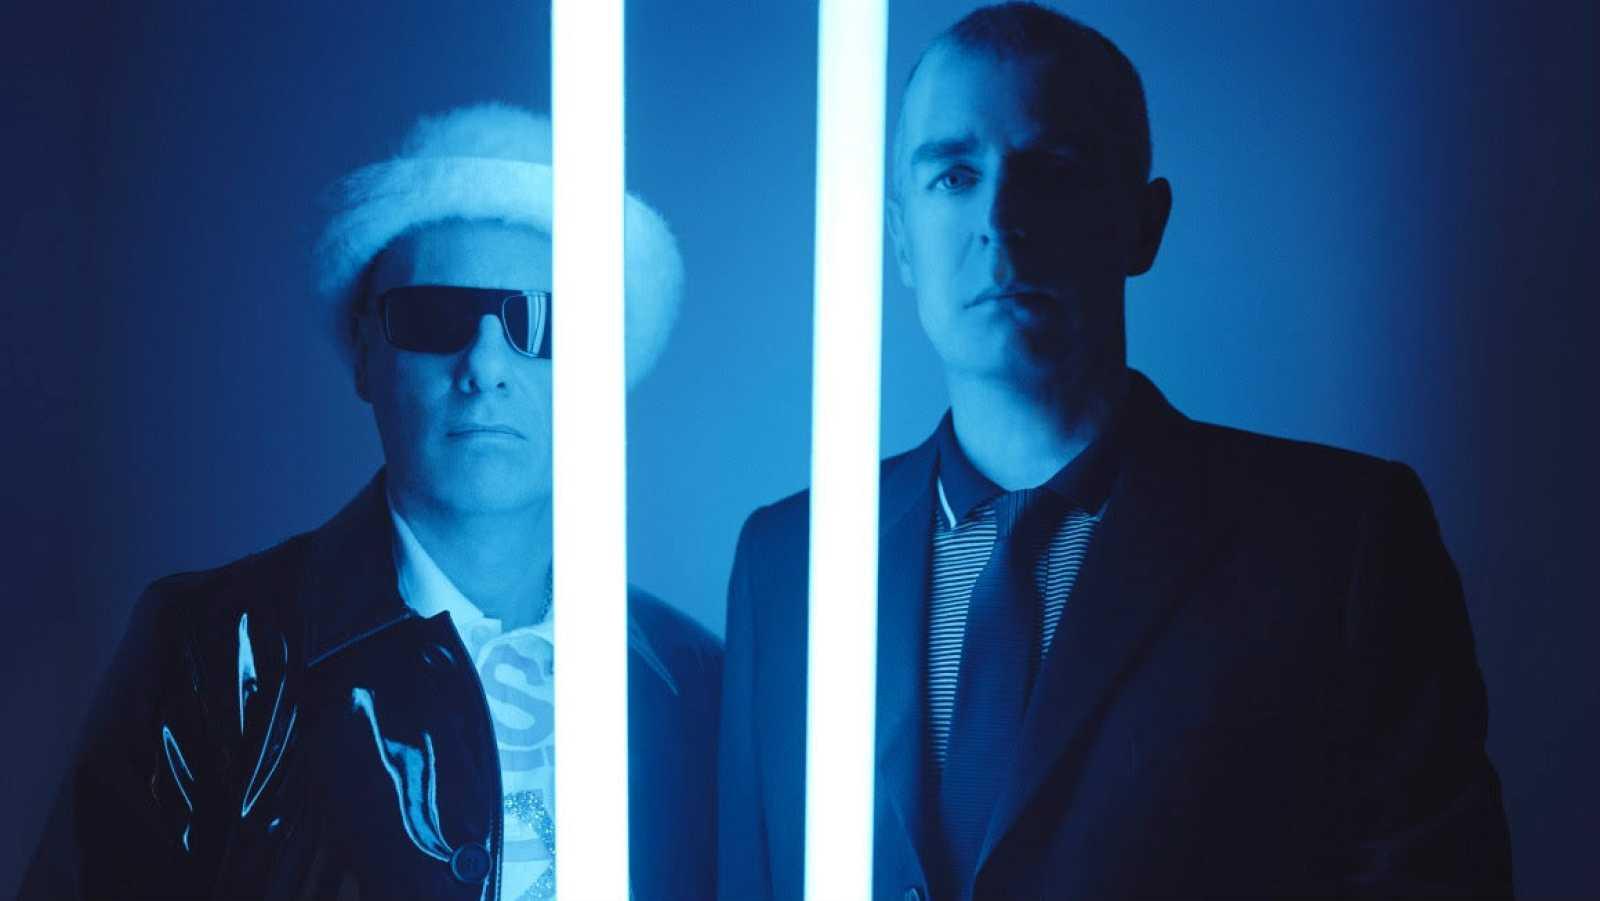 Pet Shop Boys - Reunion (Electro Mix)